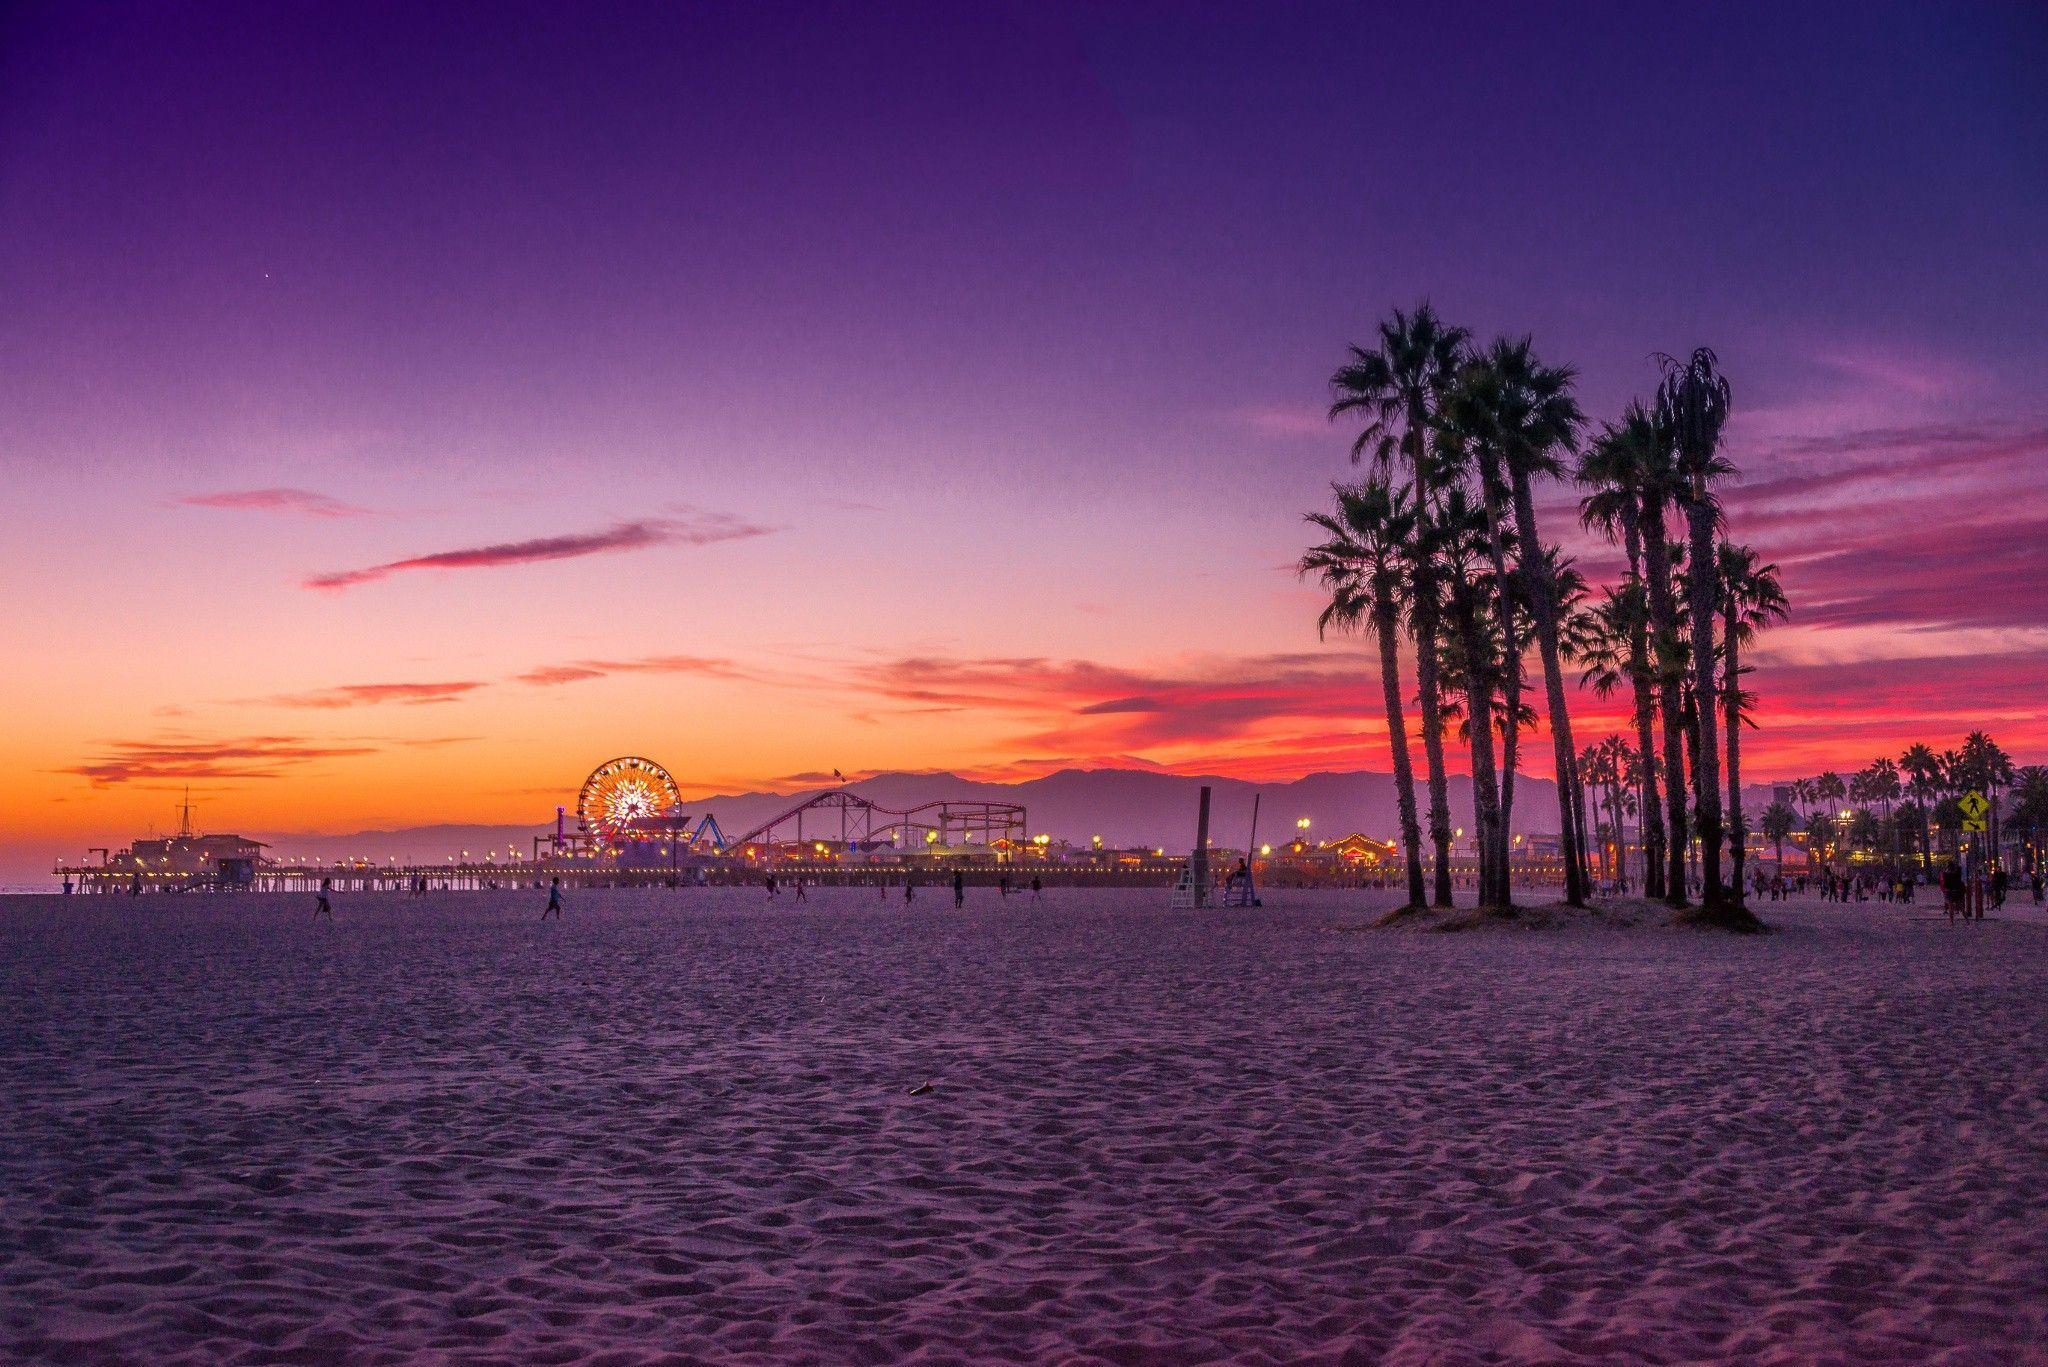 Venice Beach Sunset Wallpapers Top Free Venice Beach Sunset Backgrounds Wallpaperaccess